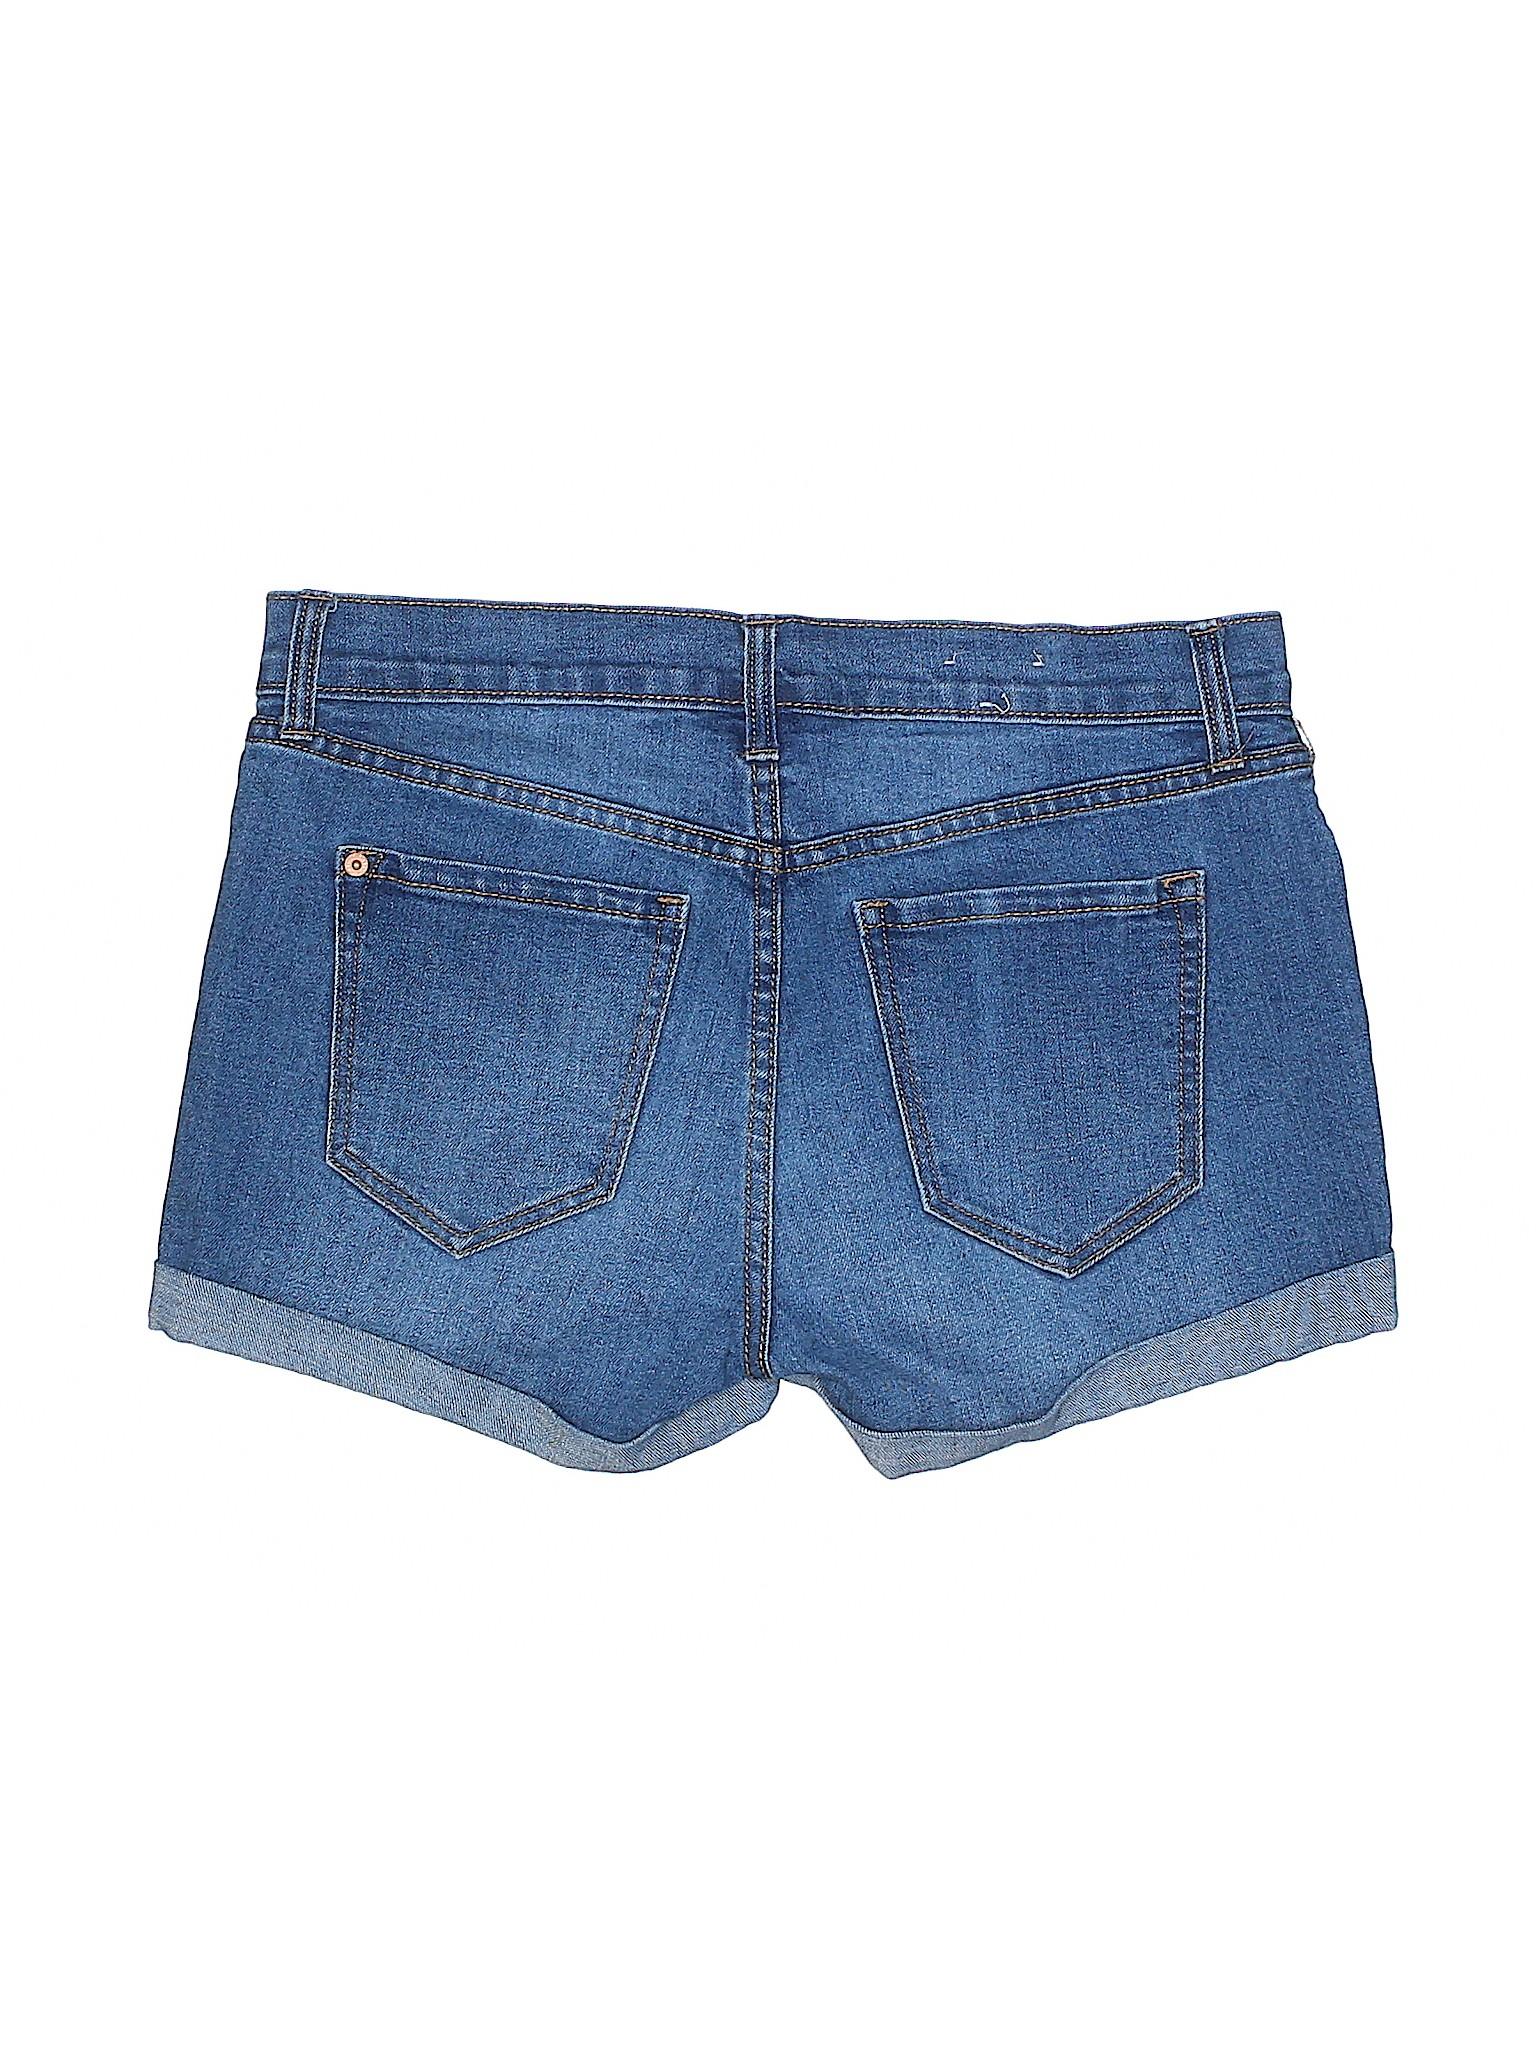 Boutique Denim Navy Navy Old Shorts Boutique Denim Shorts Old Boutique RdHqUwSO